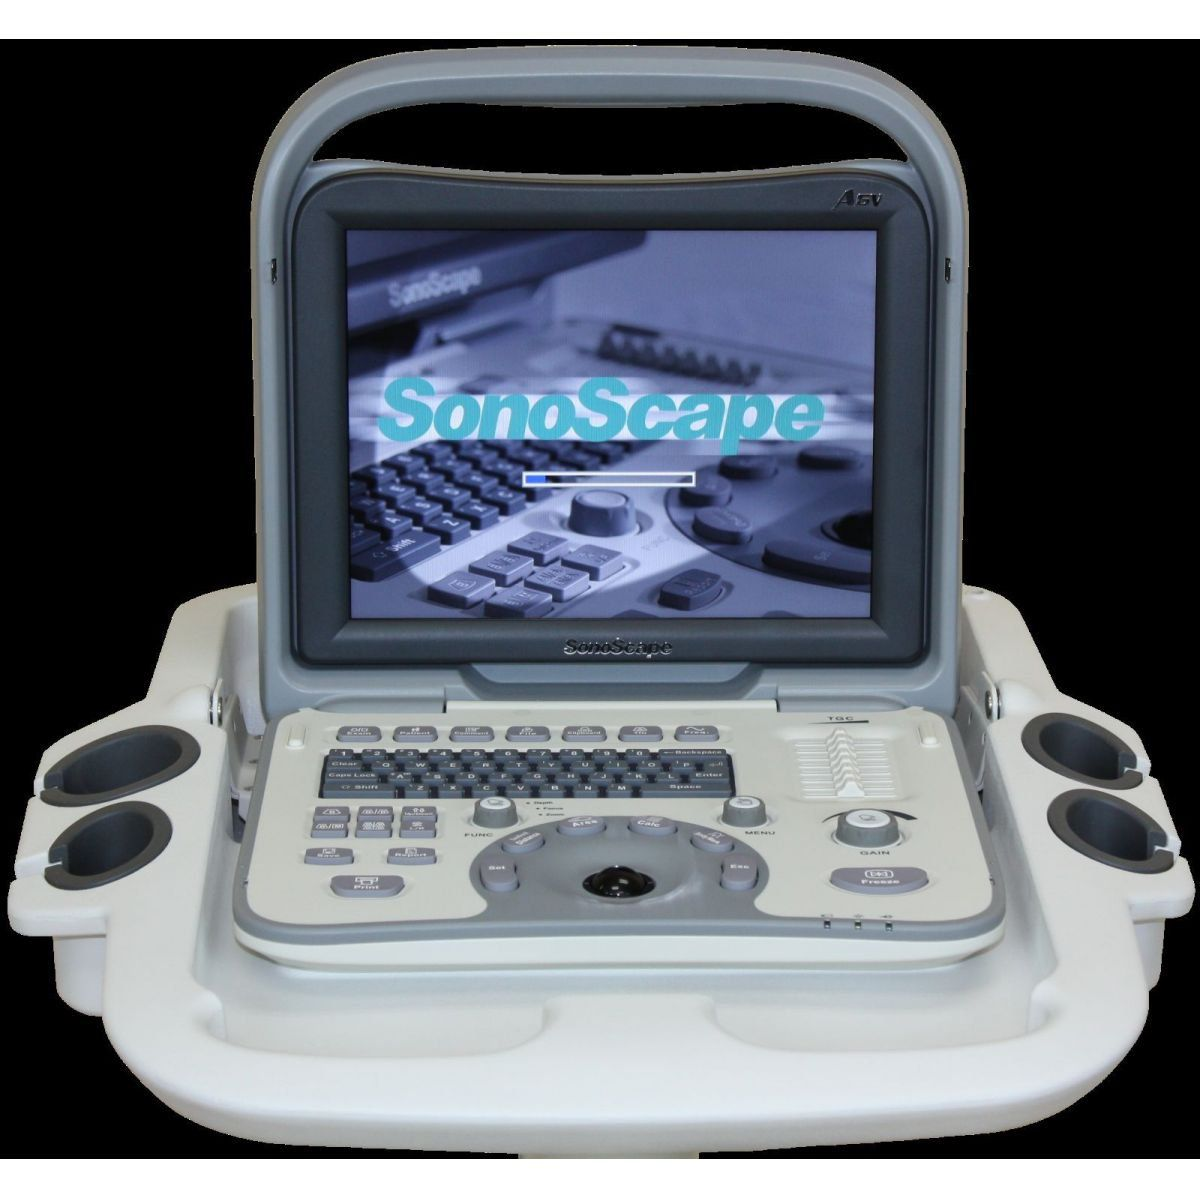 Sonoscape A6v Scanner De Ultrassom